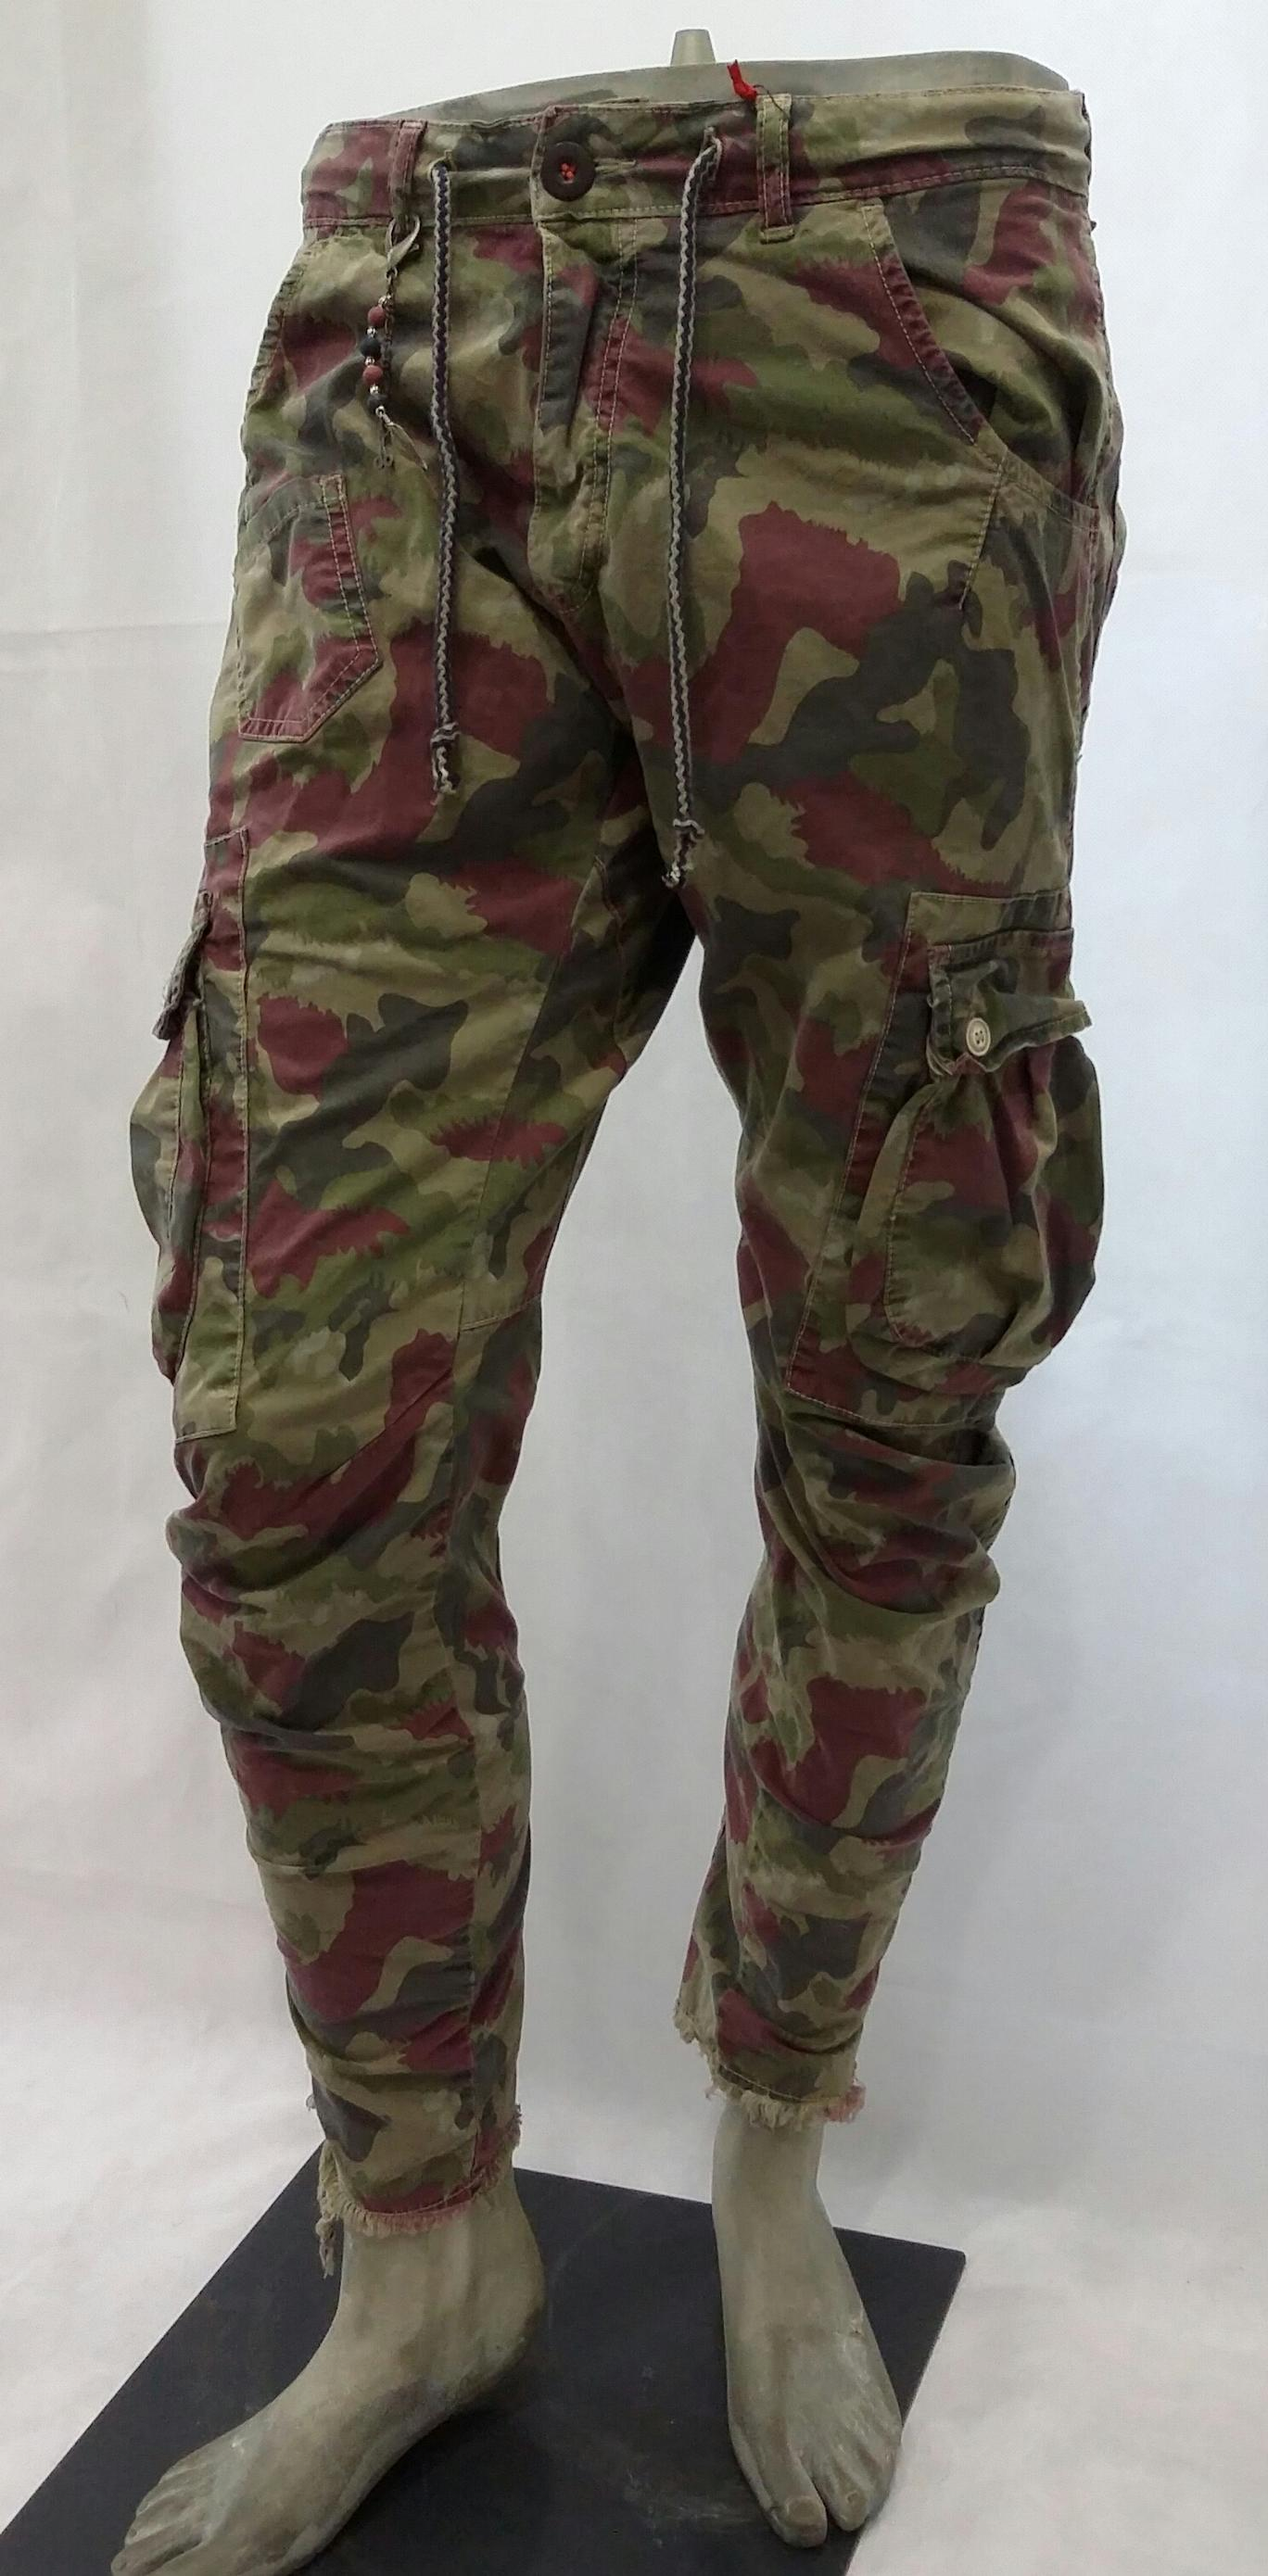 Pantalone tasconato mimetico